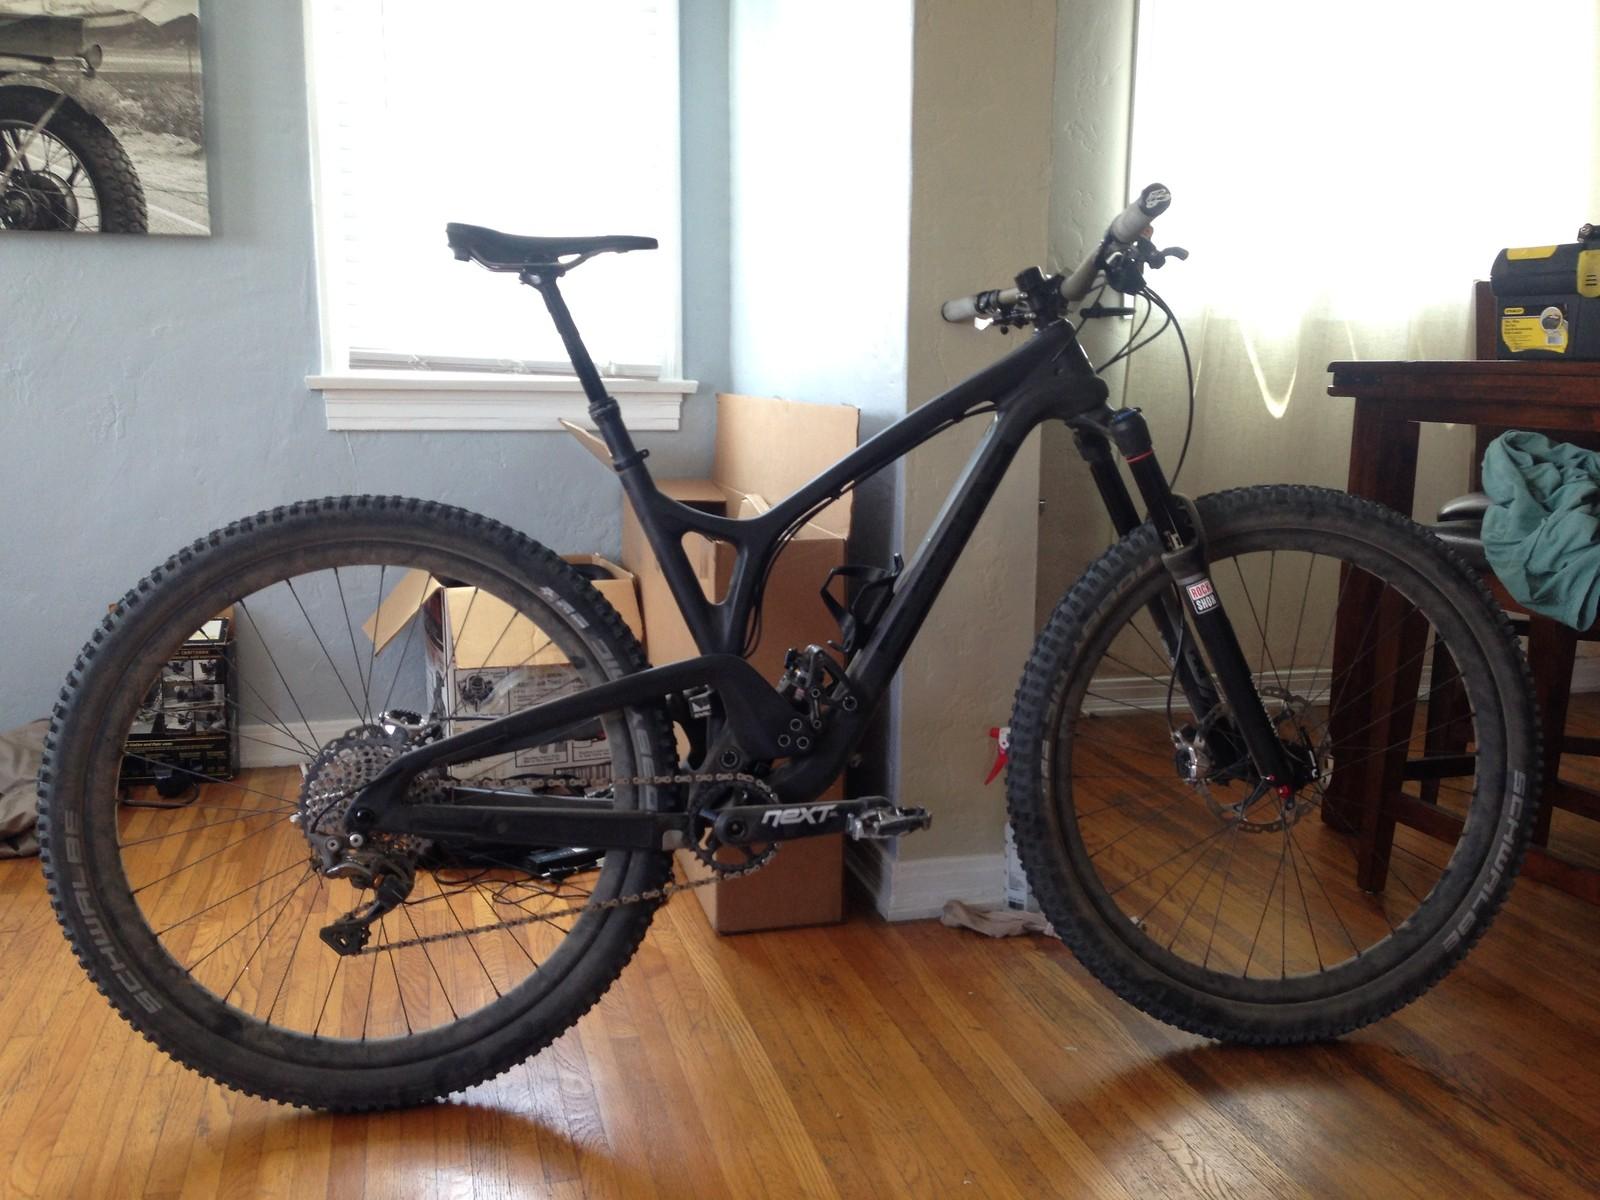 mattrofact's Evil Bikes